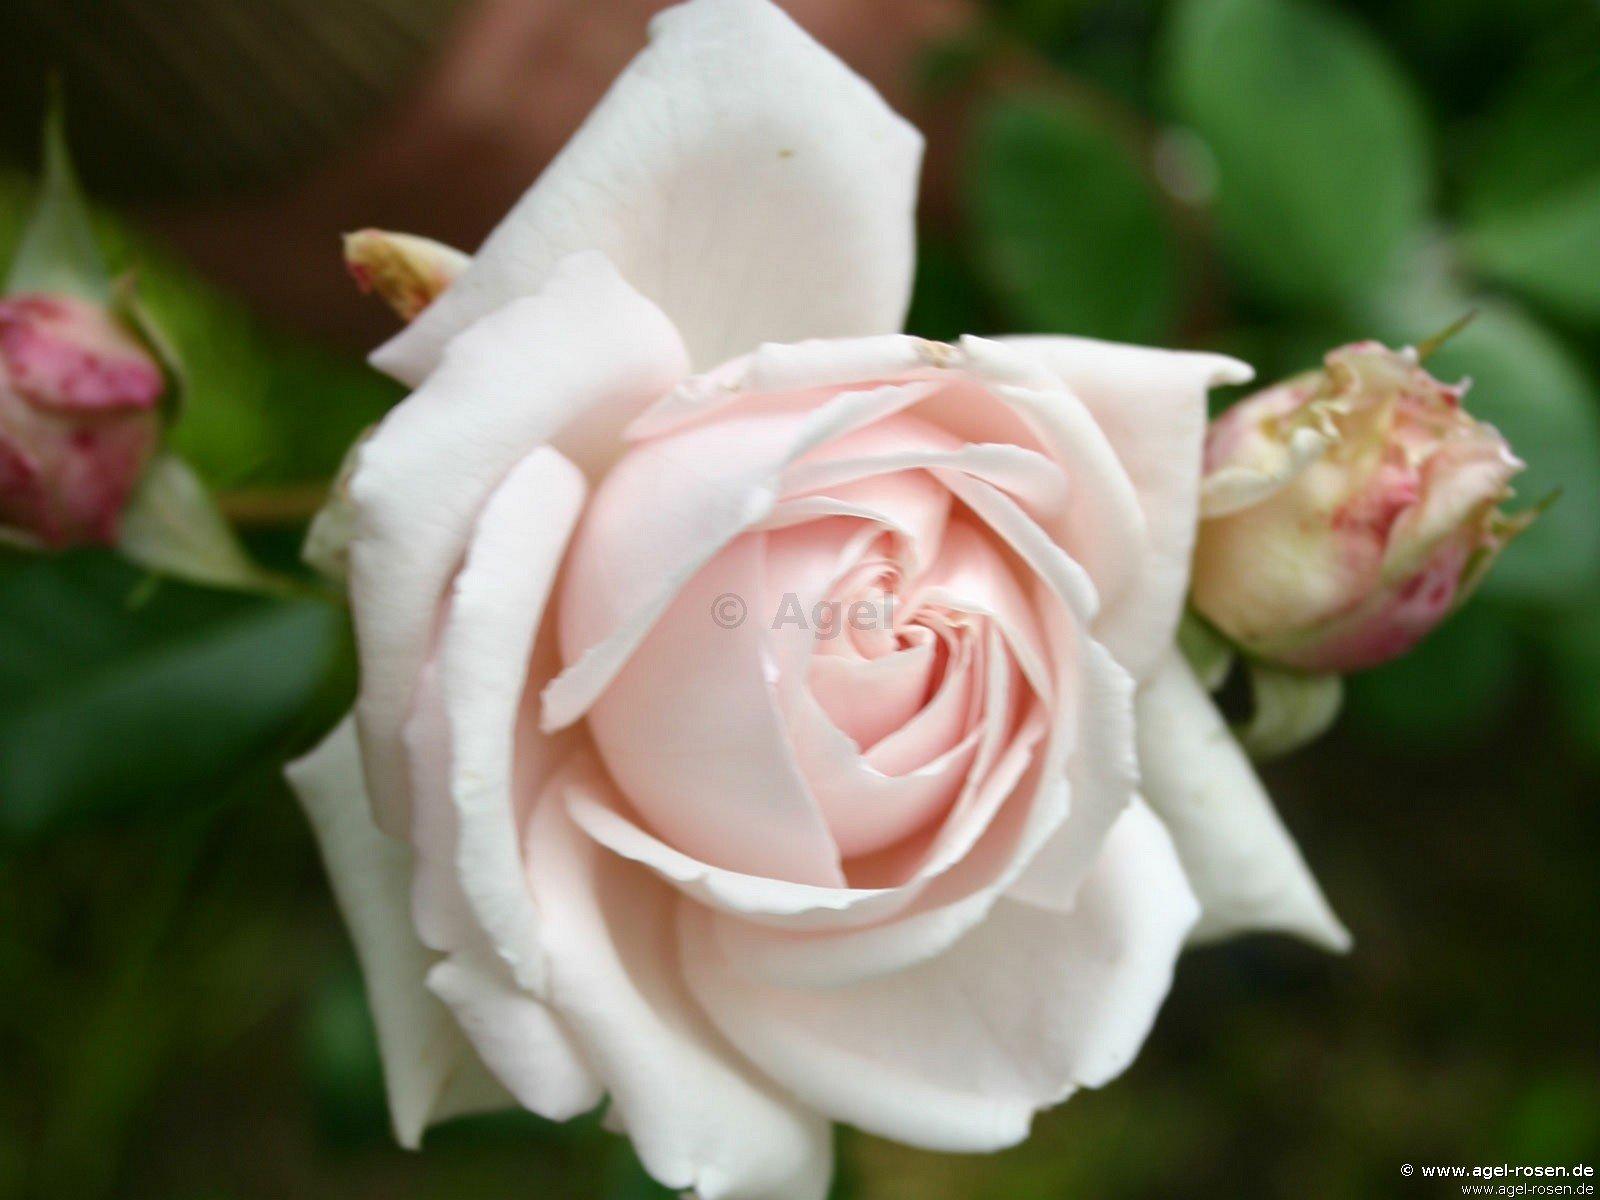 constanze mozart floribunda rose buy at agel rosen. Black Bedroom Furniture Sets. Home Design Ideas